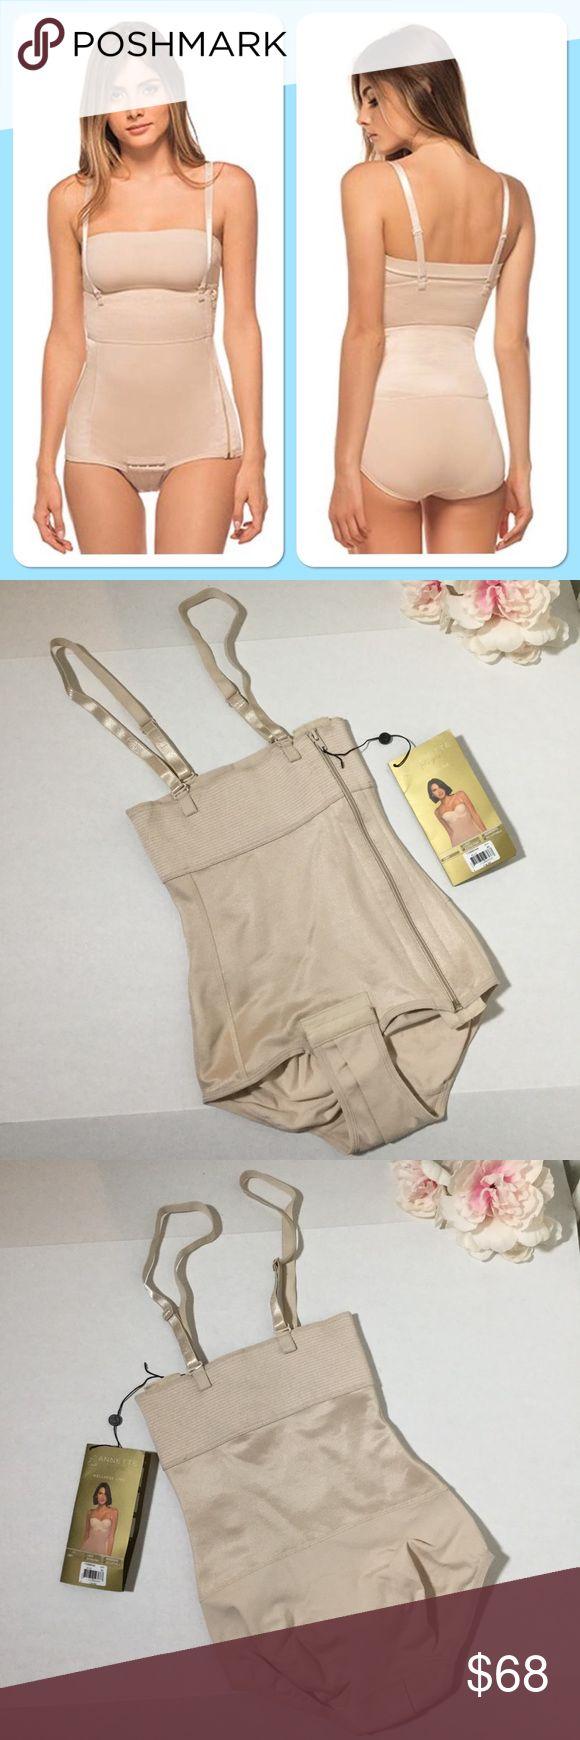 Compress garment tummy tuck, back, C-section NWT ...